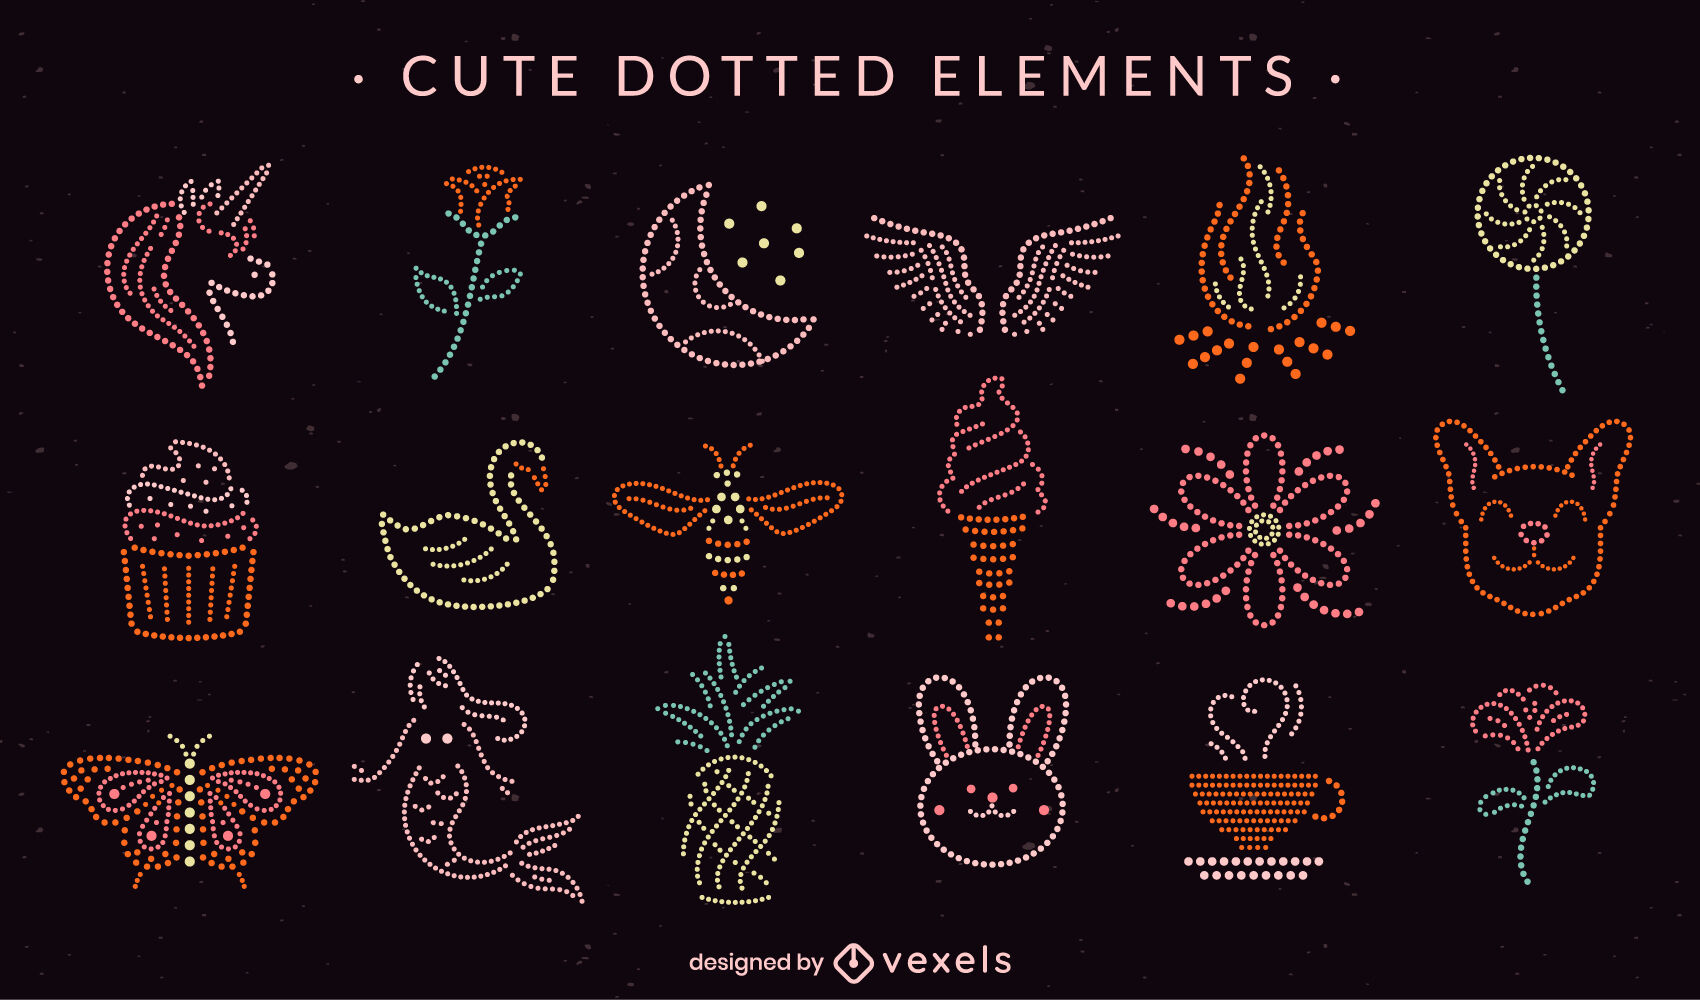 Elementos fofos pontilhados simples